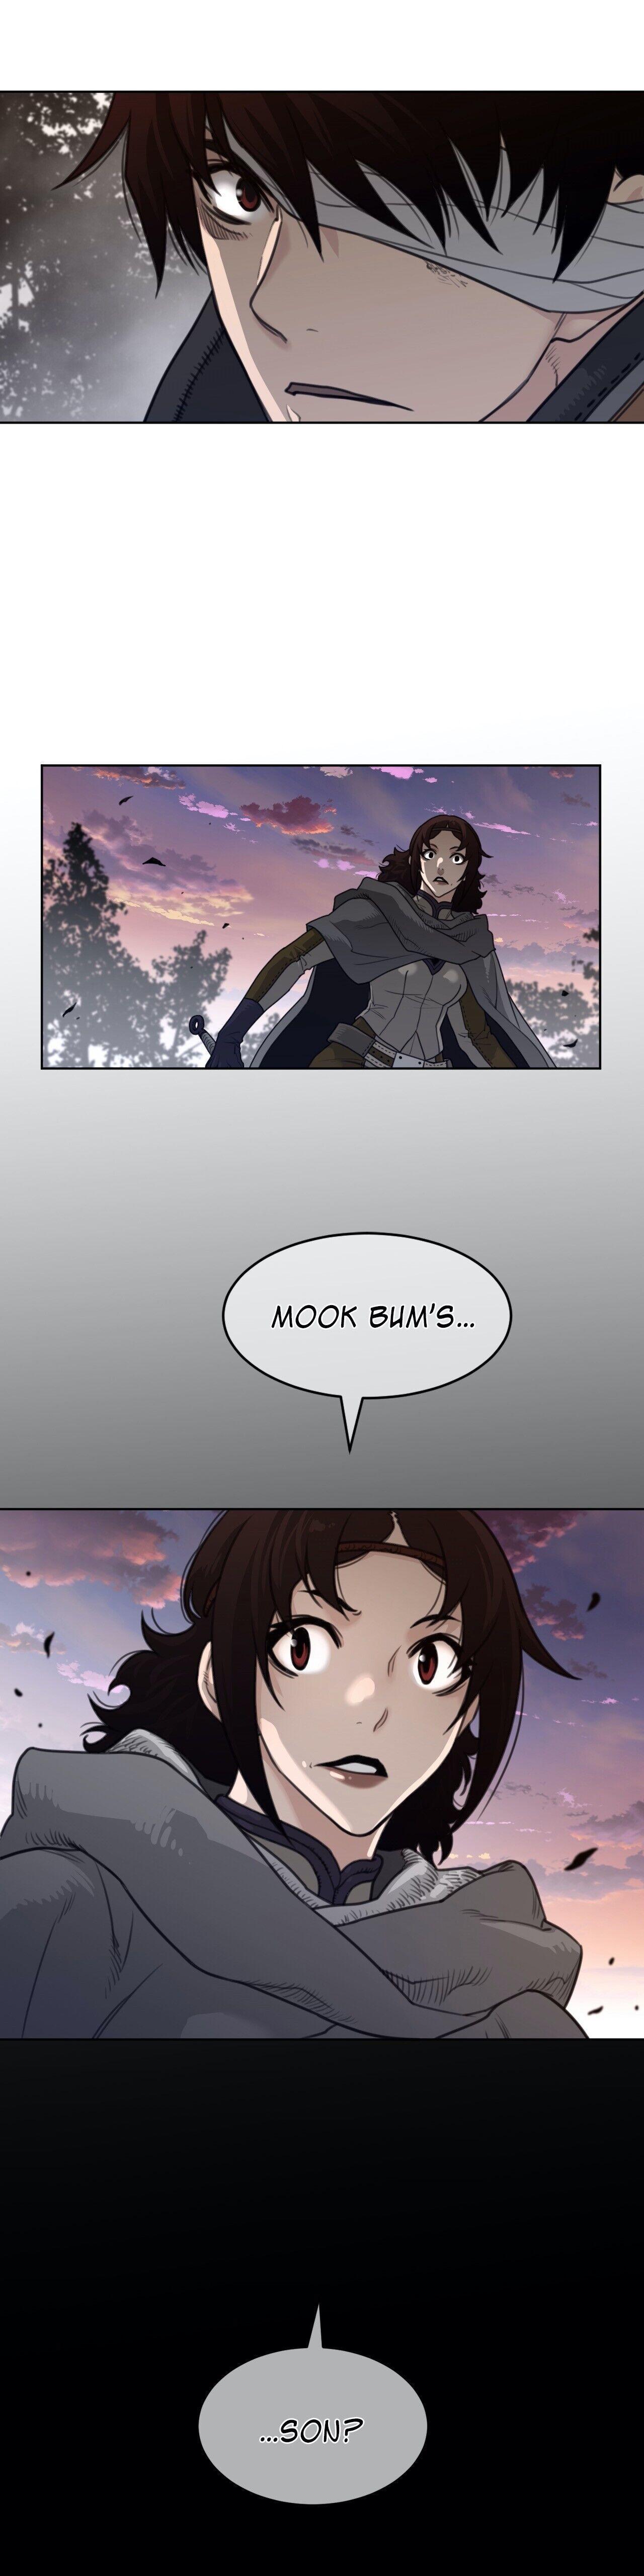 Perfect Half Chapter 135 : Another Reunion (Season 2 Finale) page 22 - Mangakakalots.com